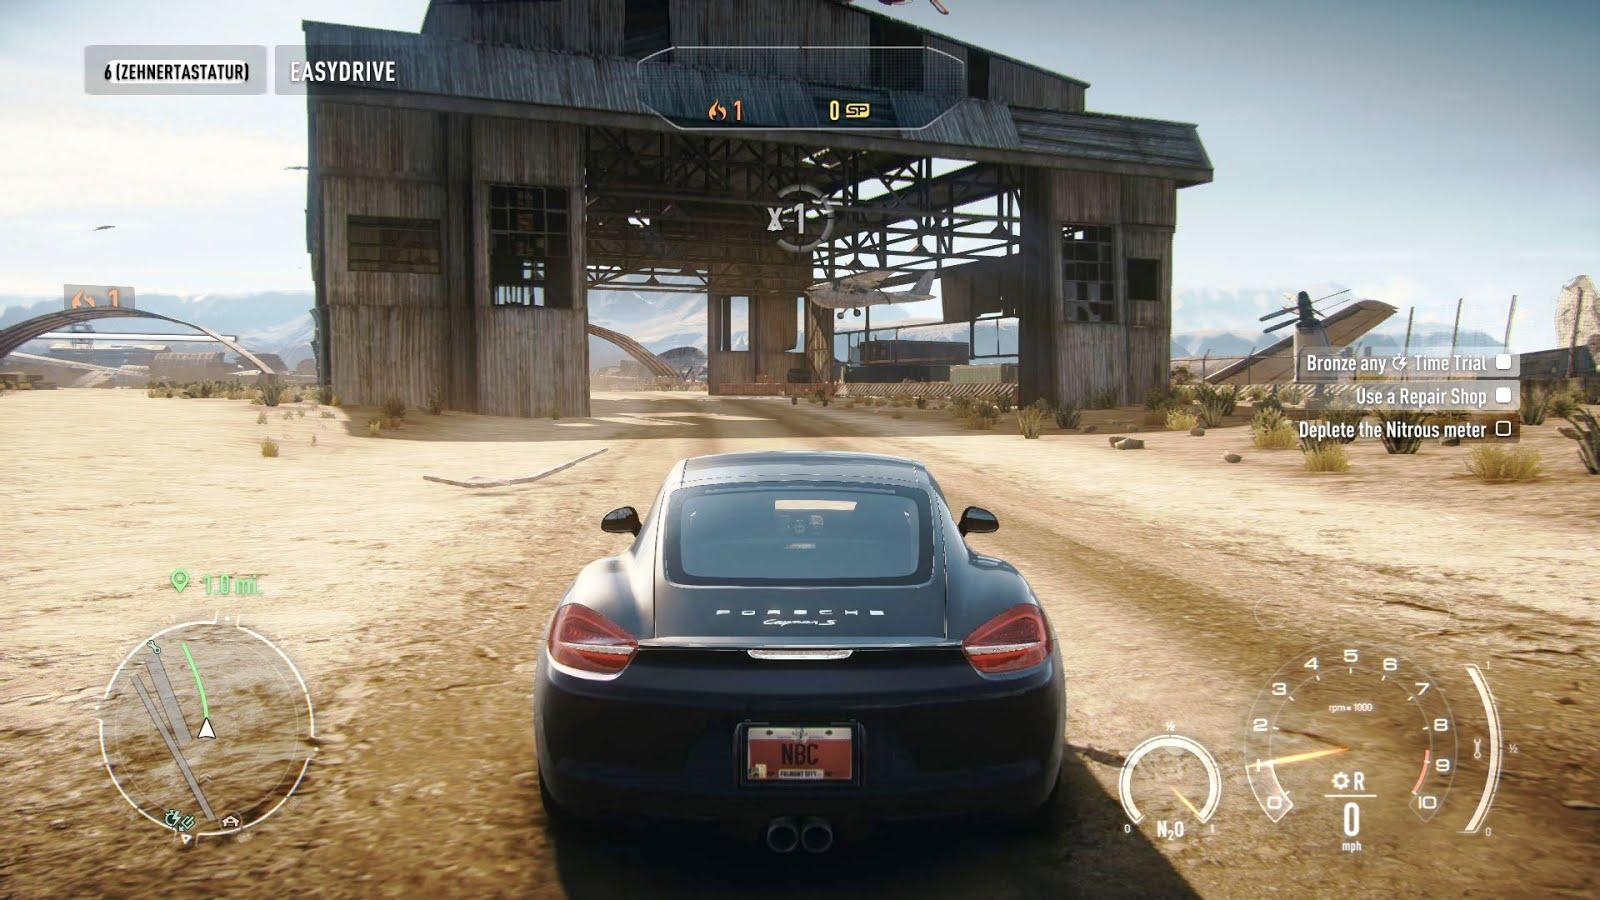 تحميل لعبة Need For Speed Rivals Pc بحجم Mediafire 3gb رابط